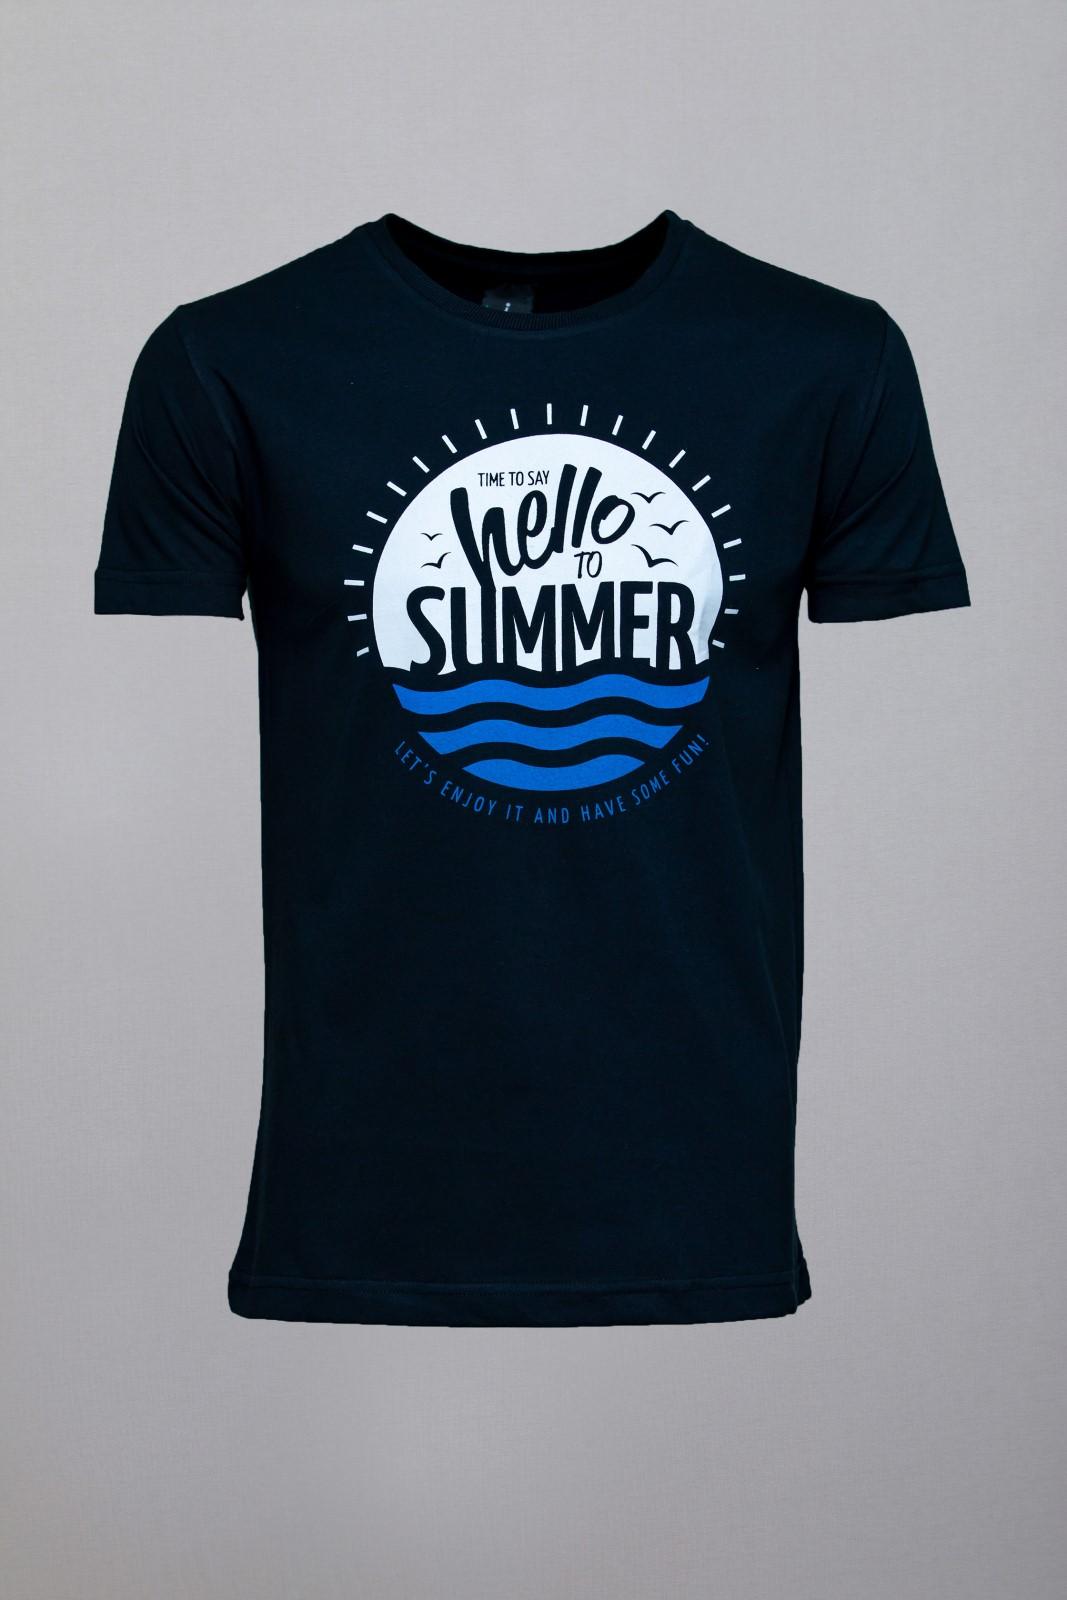 Camiseta CoolWave Hello to Summer Preta